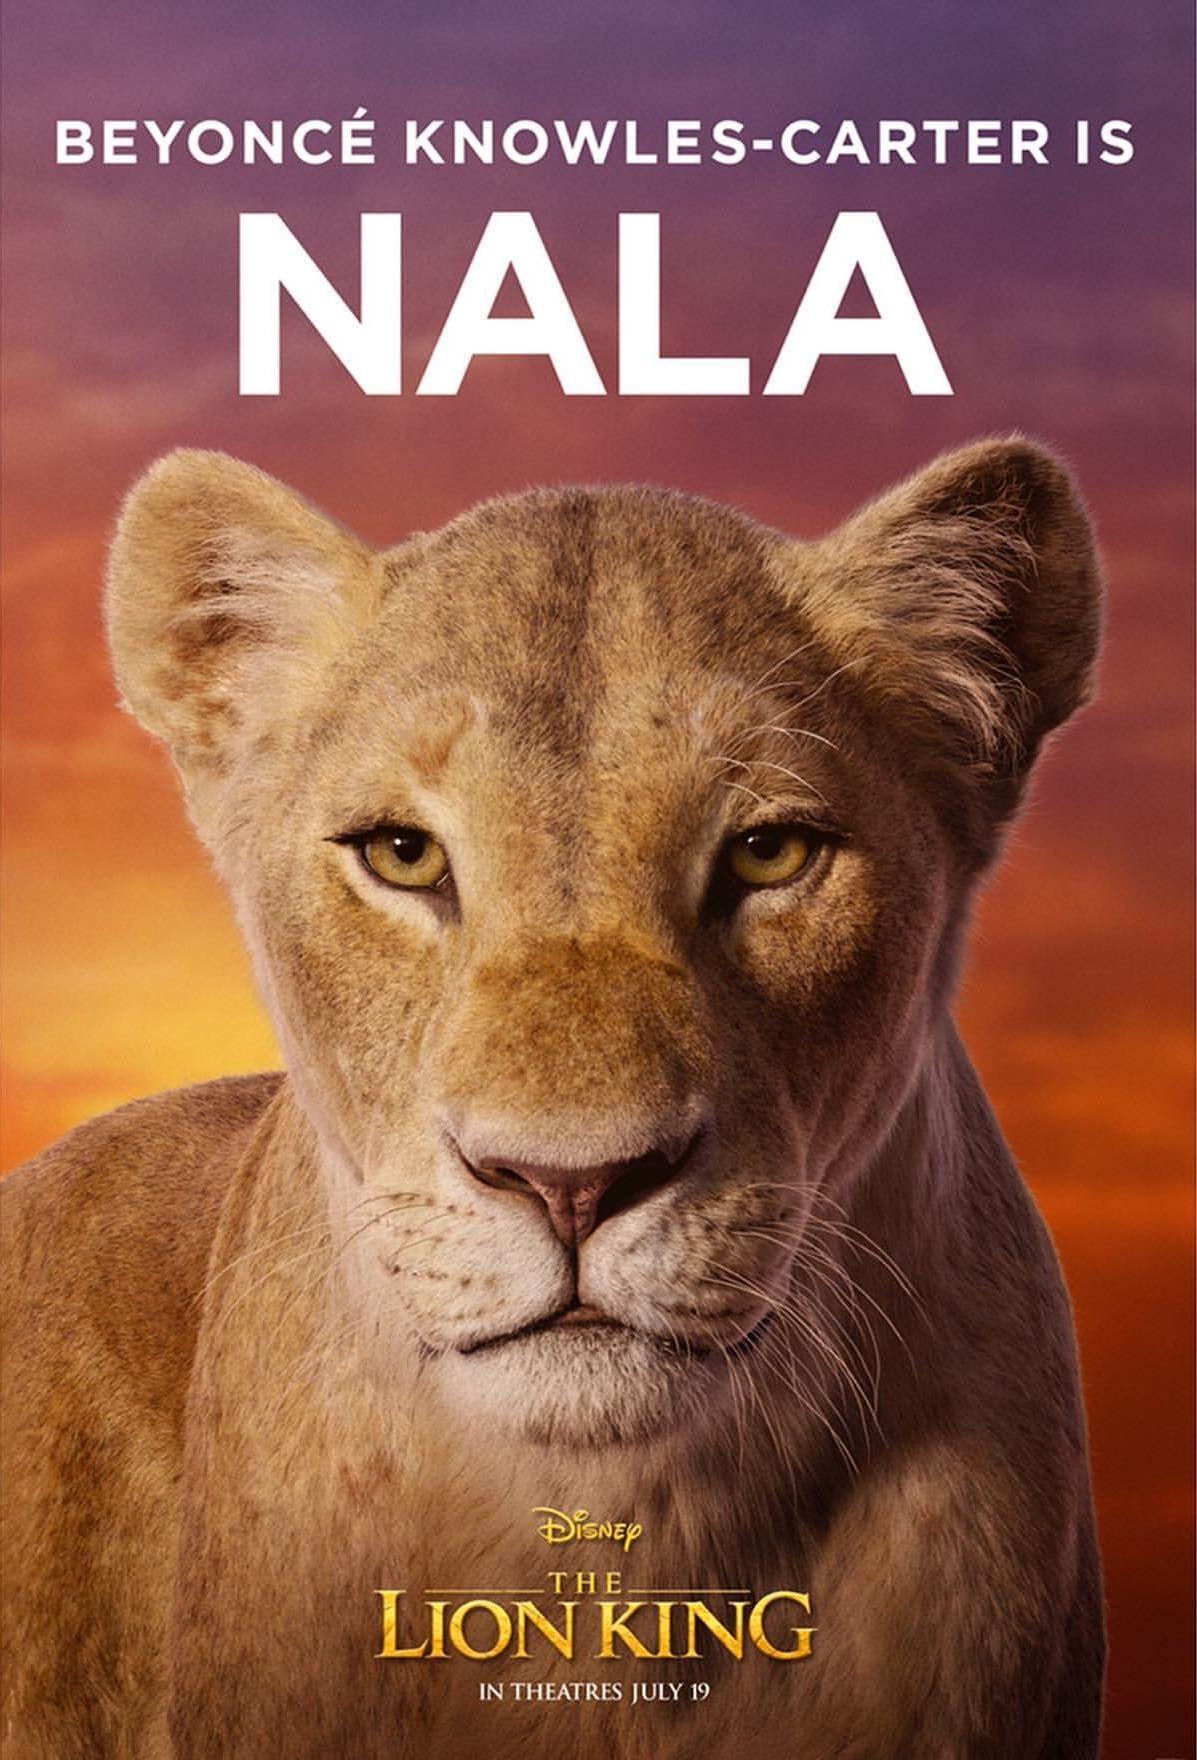 Beyonce As Nala Thelionking Lion King Poster